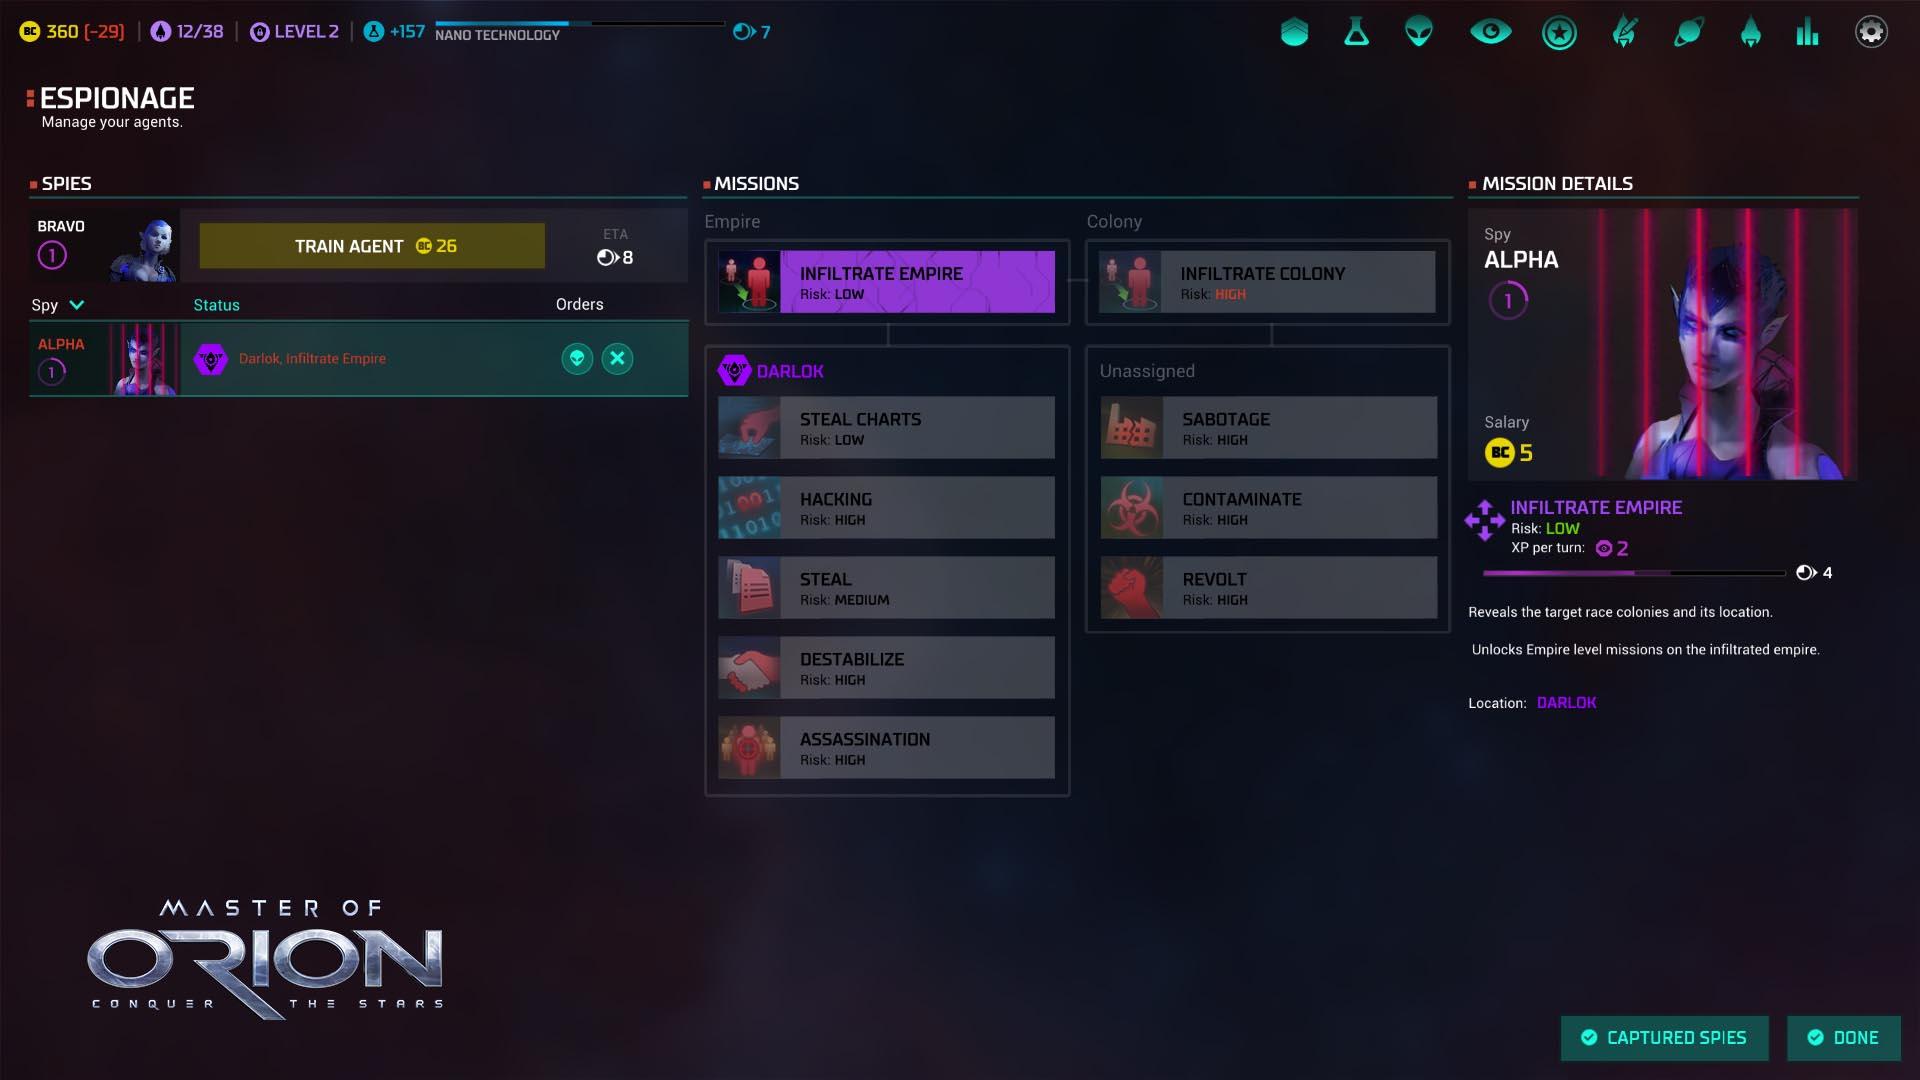 MoO_DLC_Screens_Interface_2 Kopie